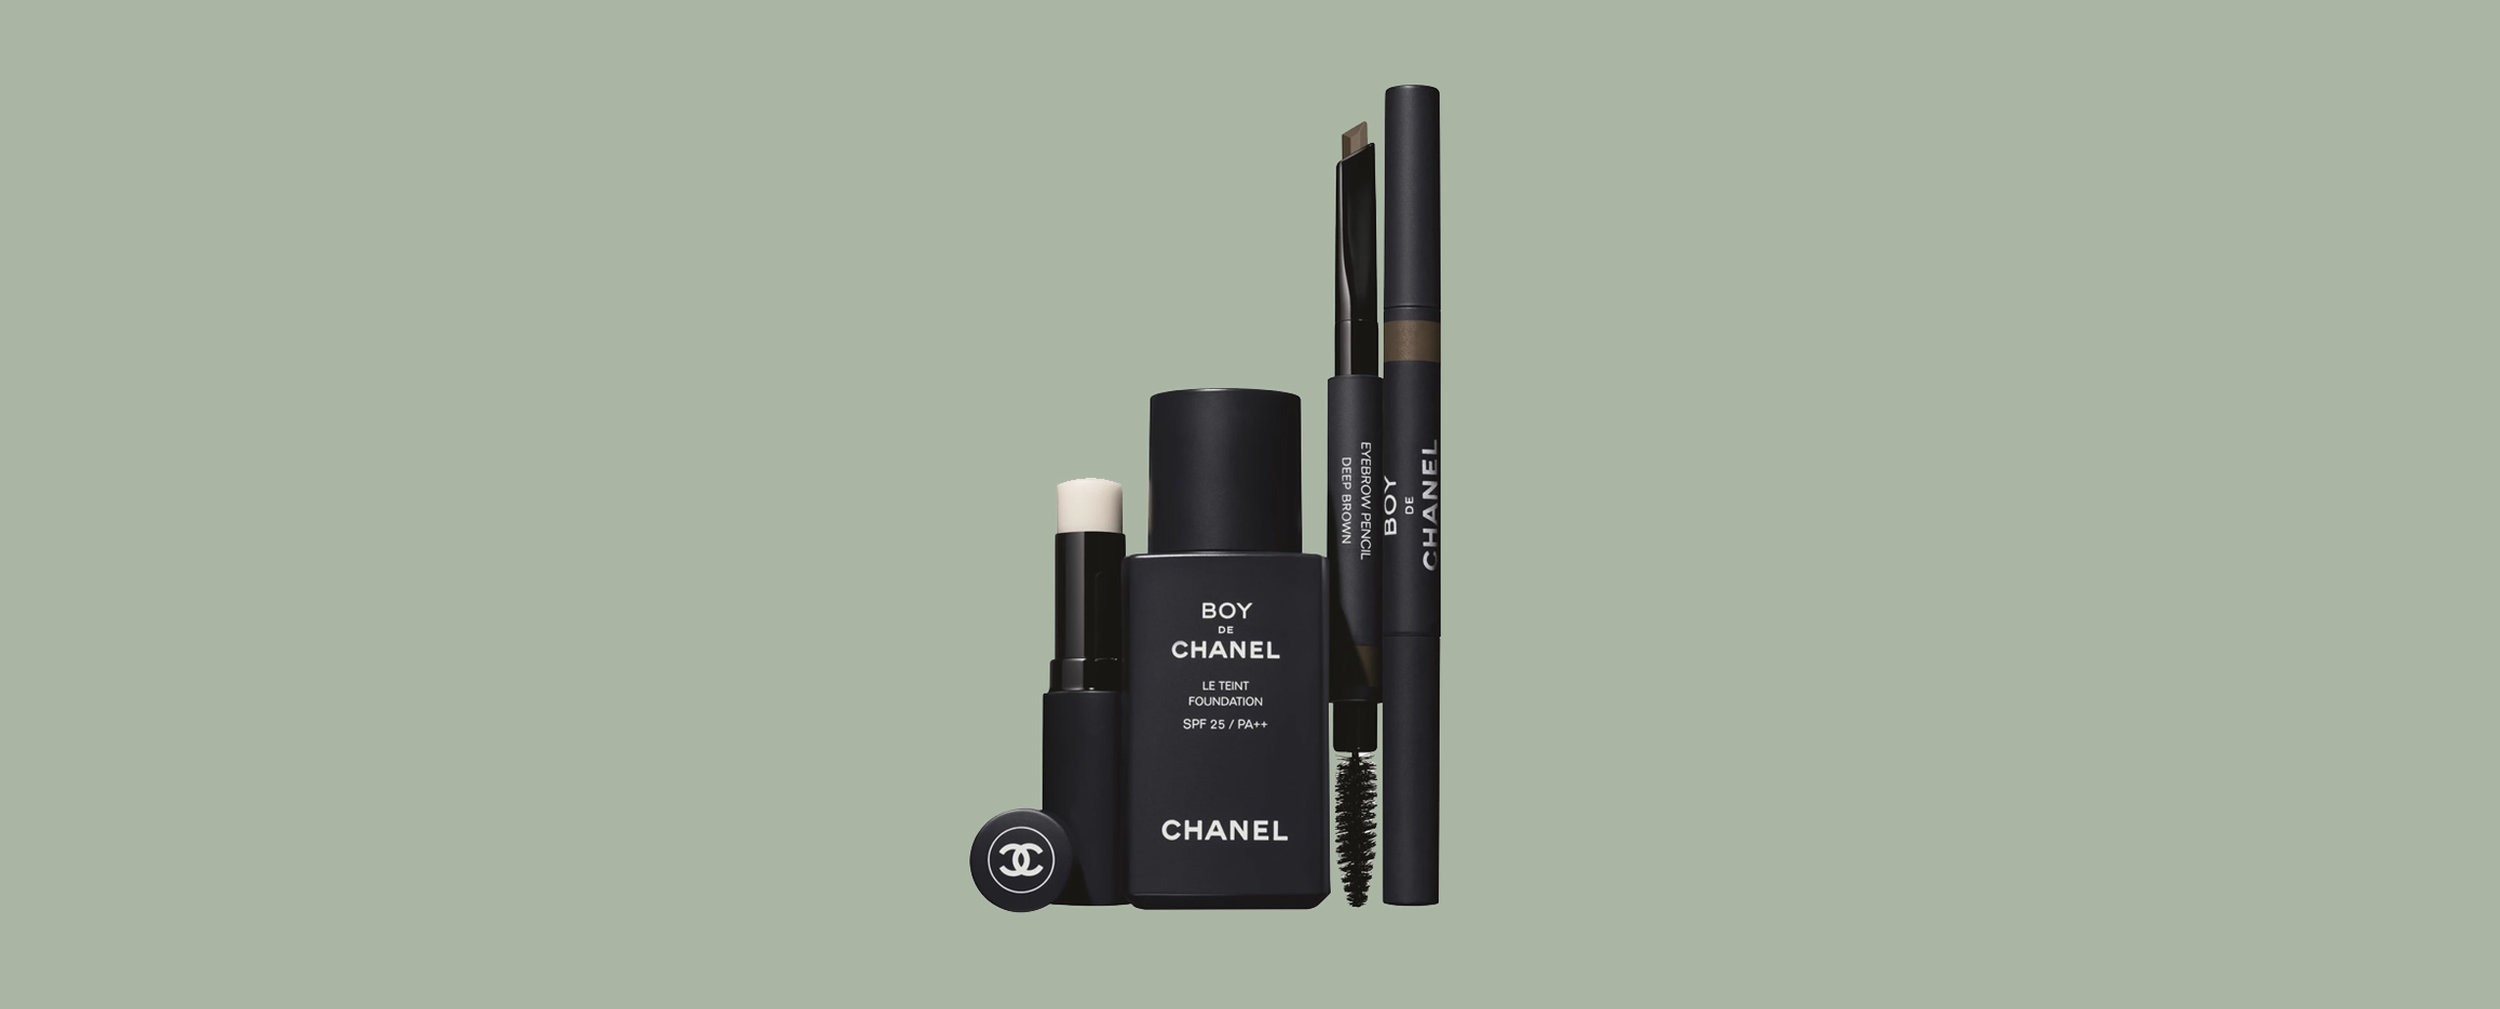 Photo source: Chanel